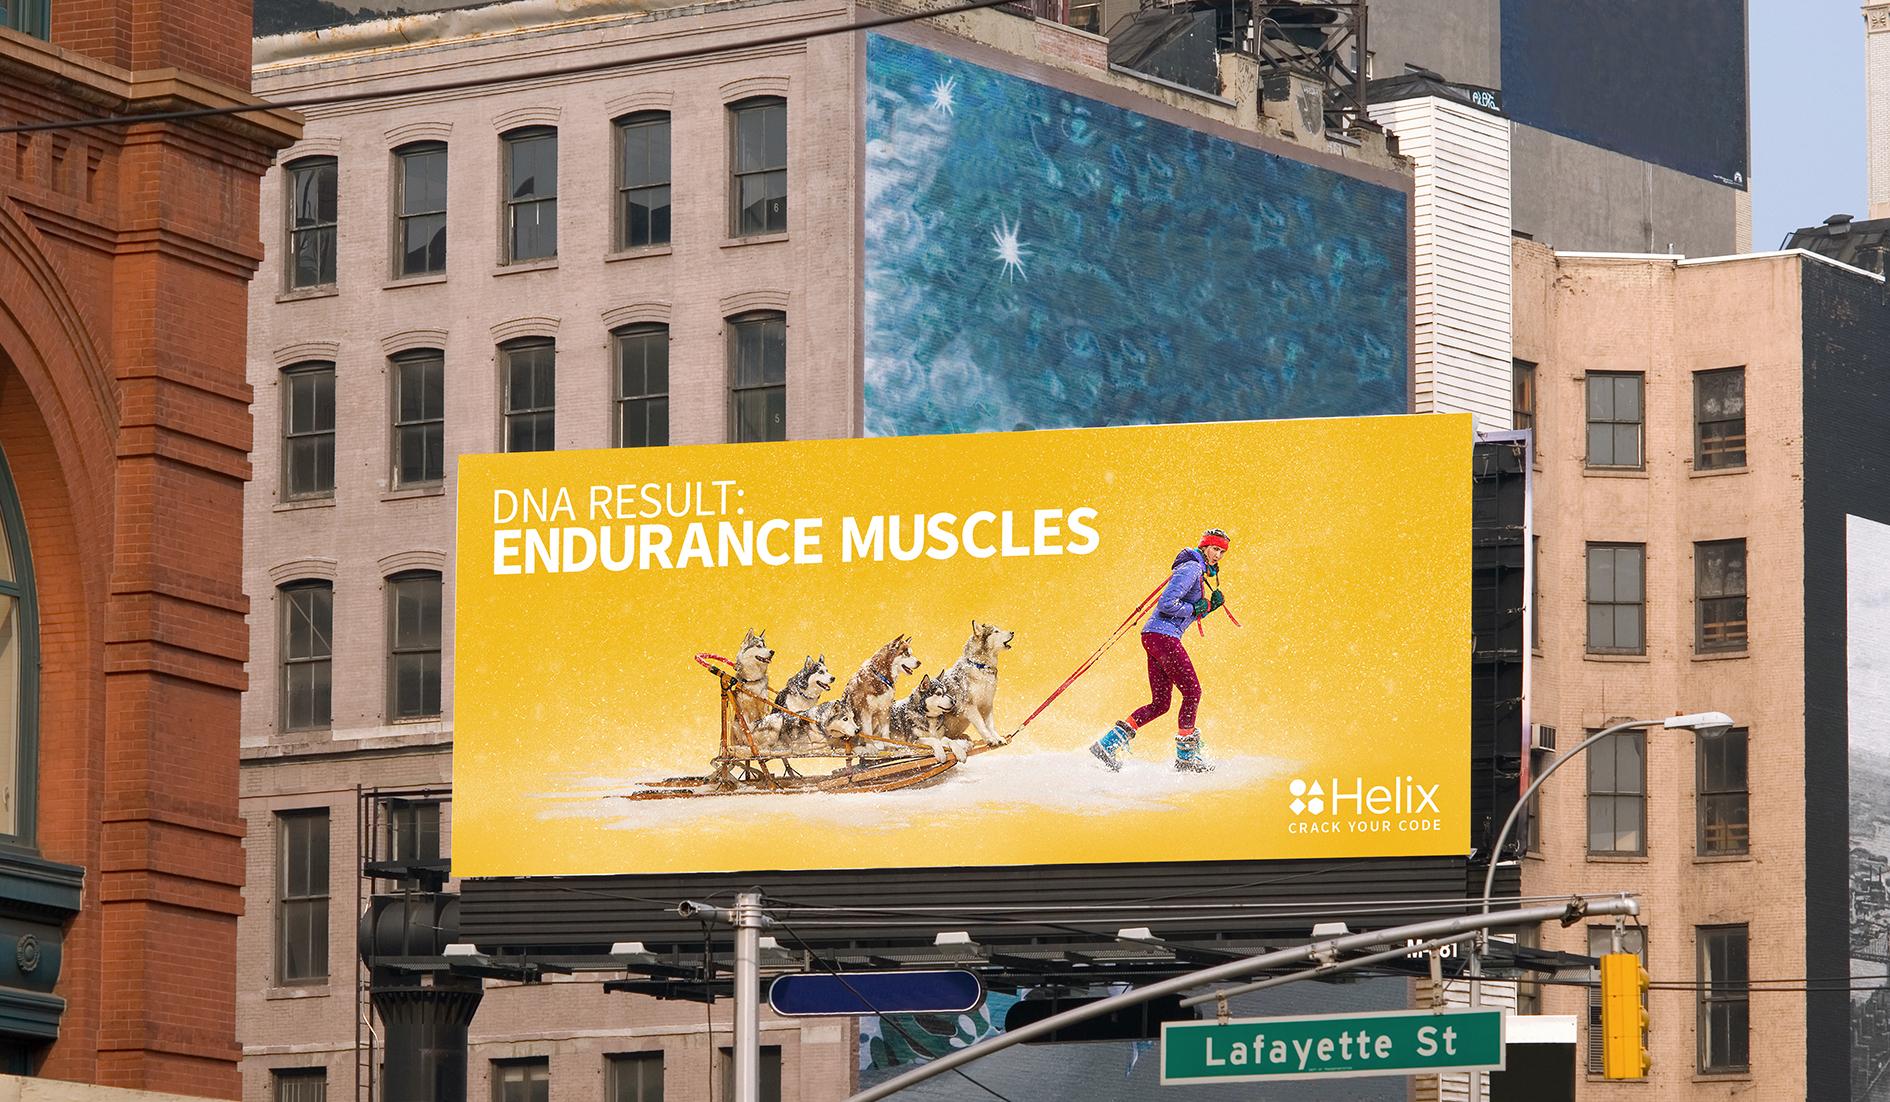 billboard 3.jpg